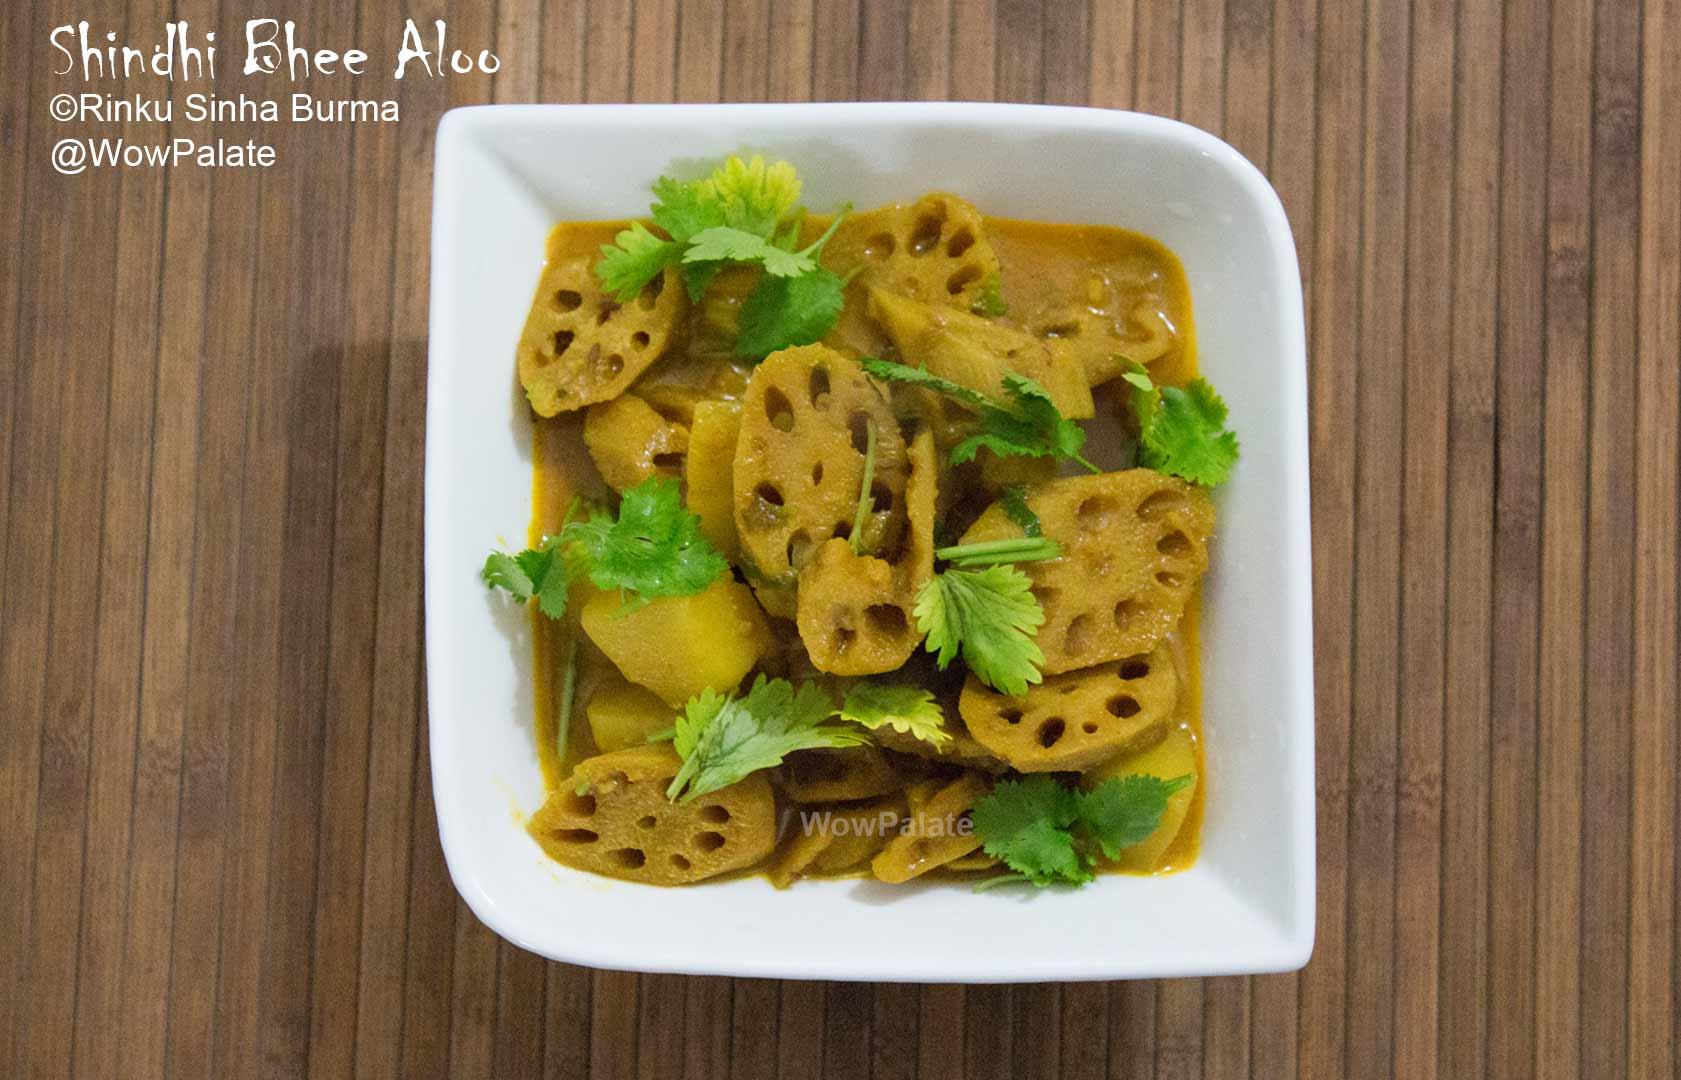 Shindhi Bhee Aloo (Lotus Stem and Potato)